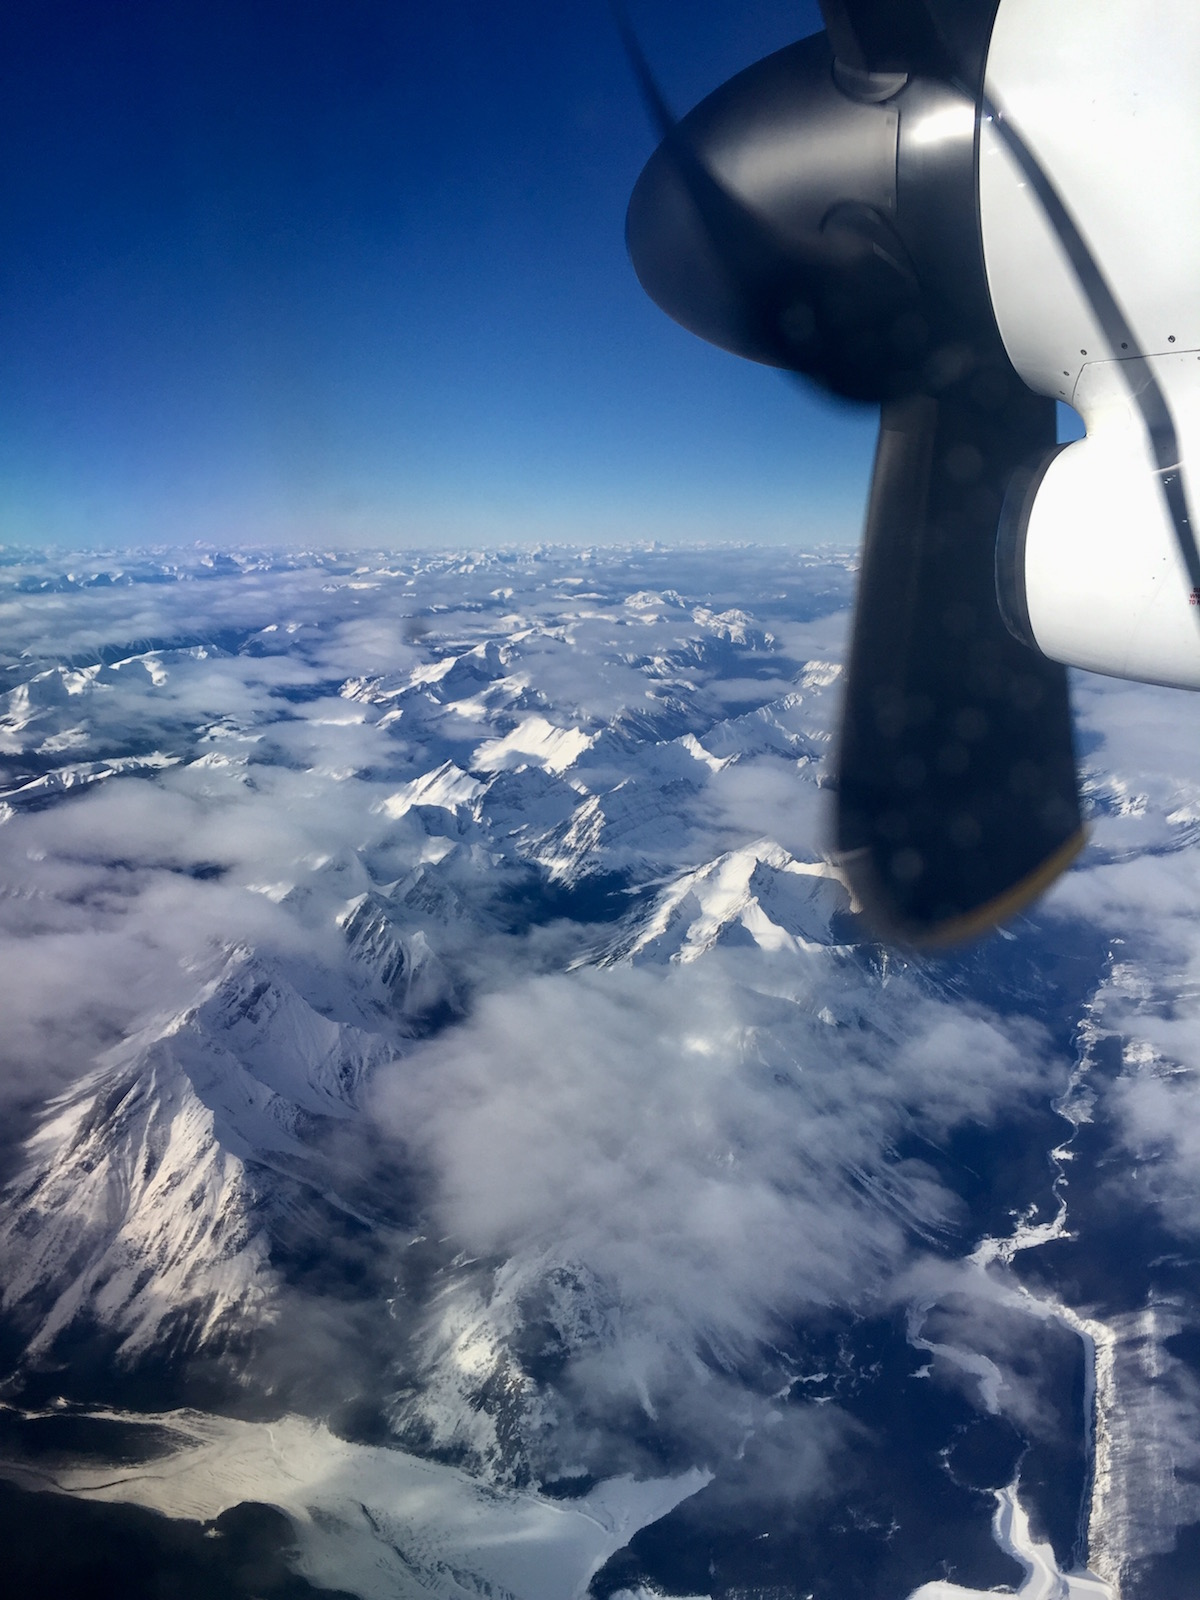 travel-blog-blogger-redhead-round-the-world-airplane-window-moutain.jpg